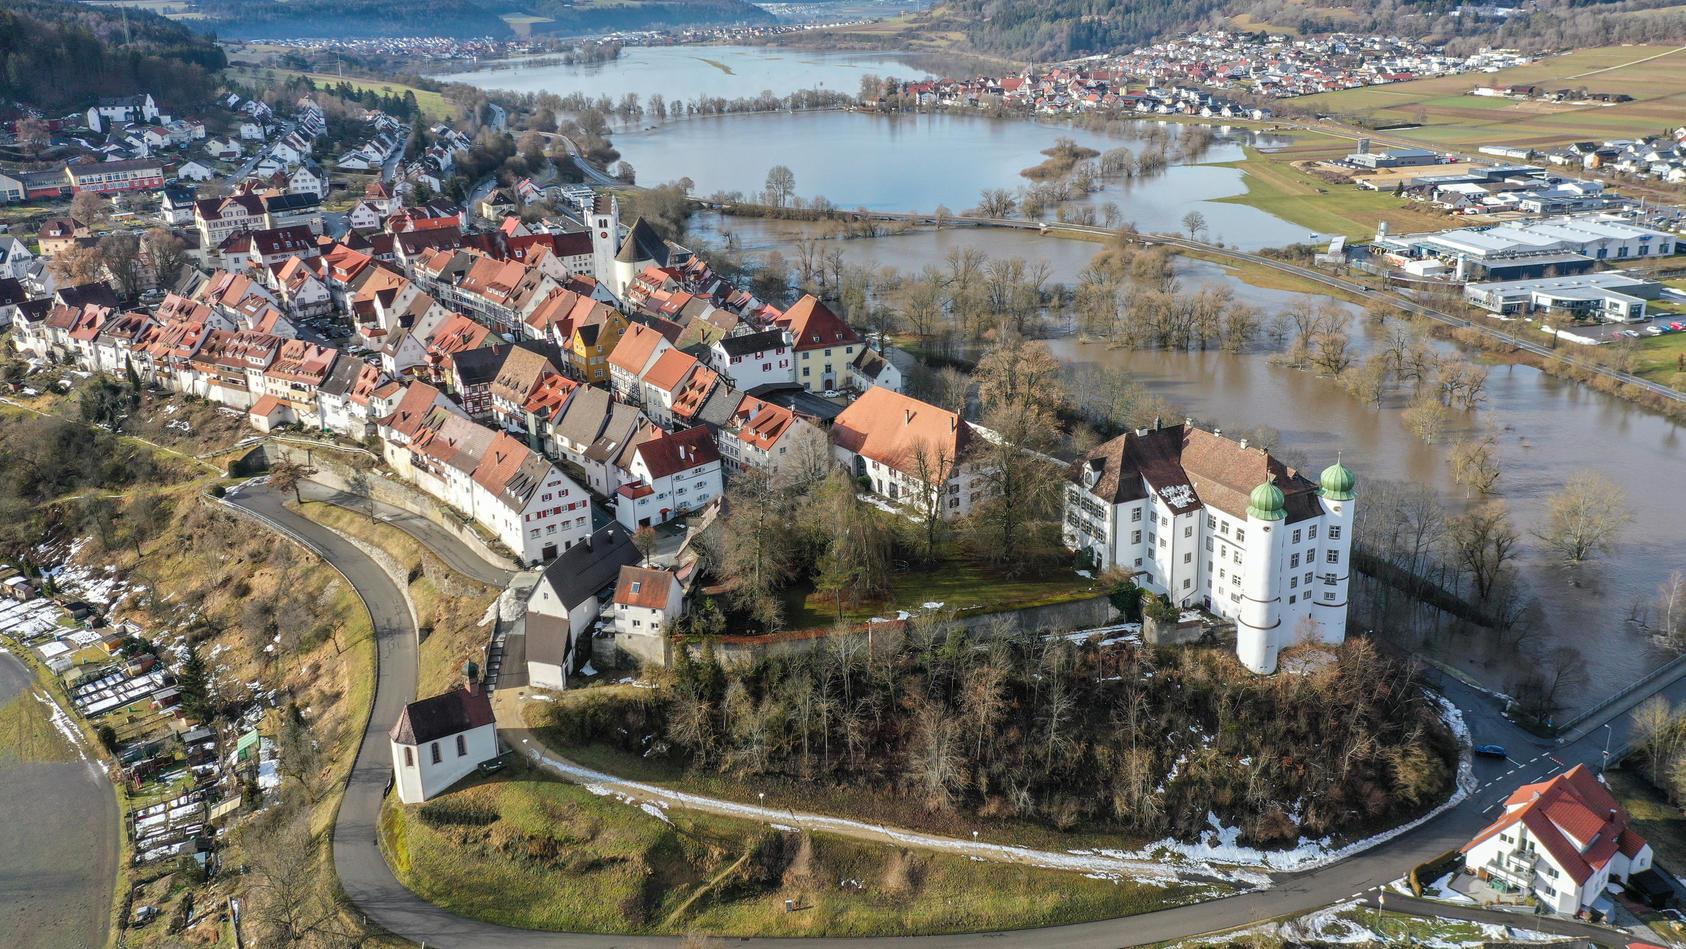 Coronavirus - Mühlheim an der Donau